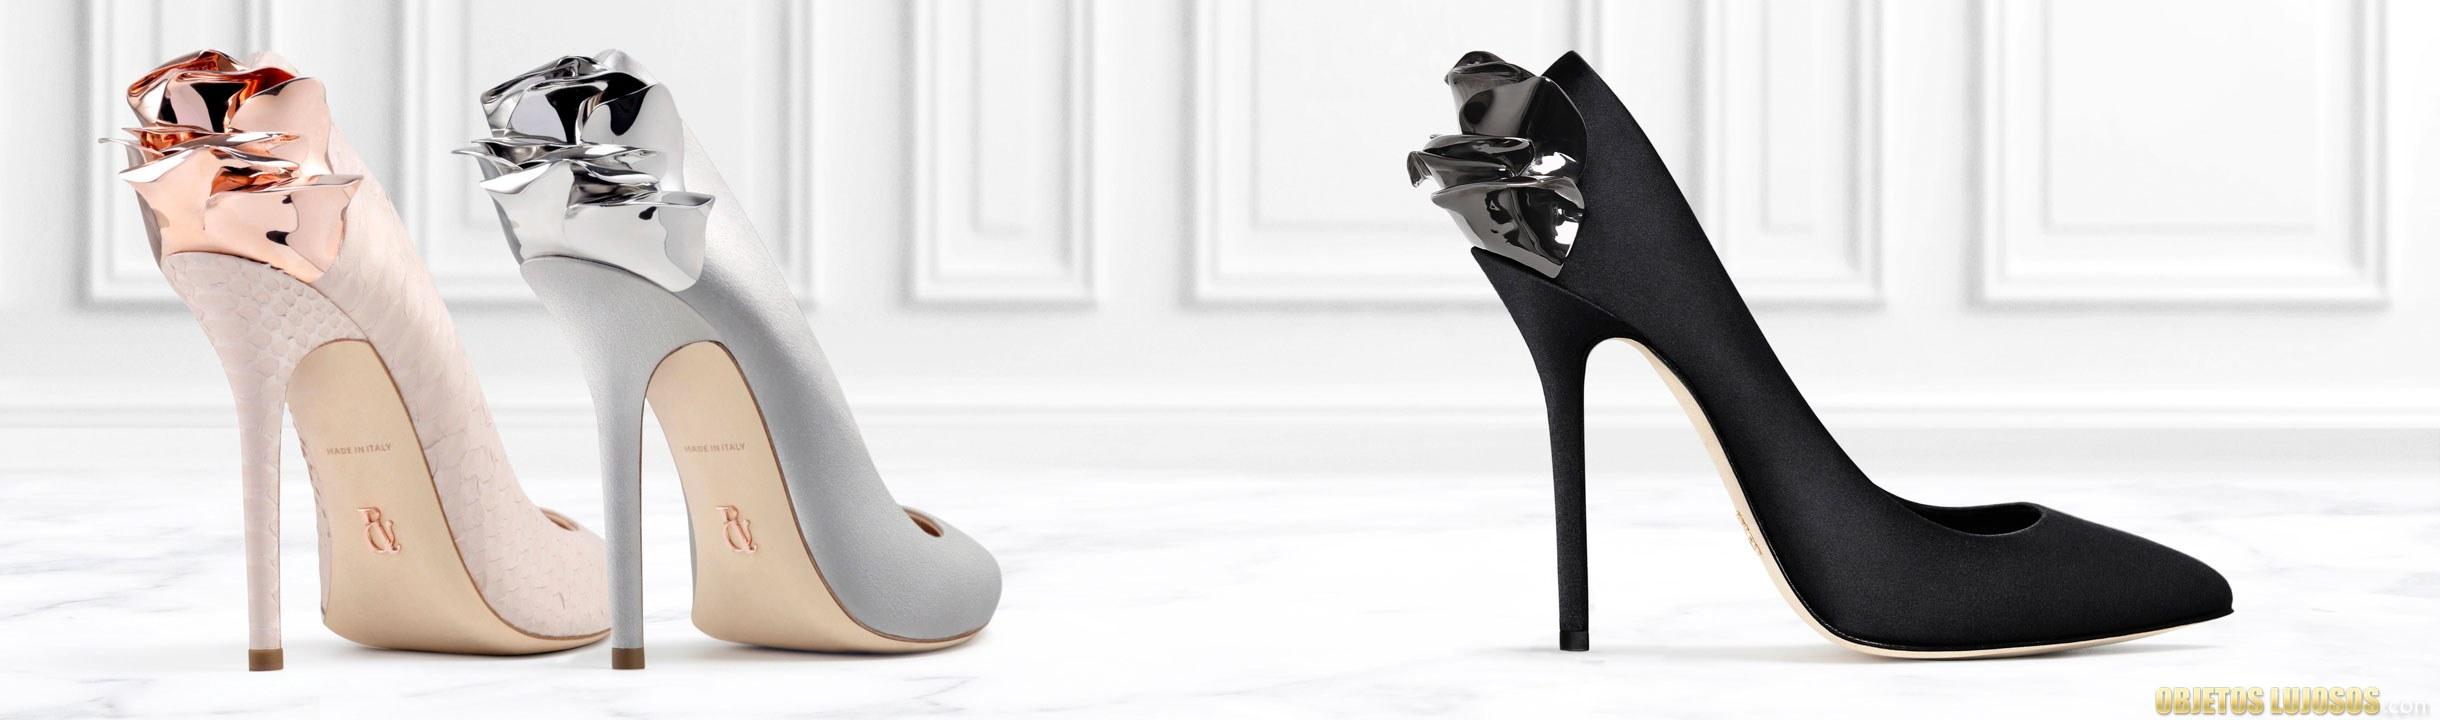 zapatos-de-lujo-Ralph-&-Russo-Anallasa